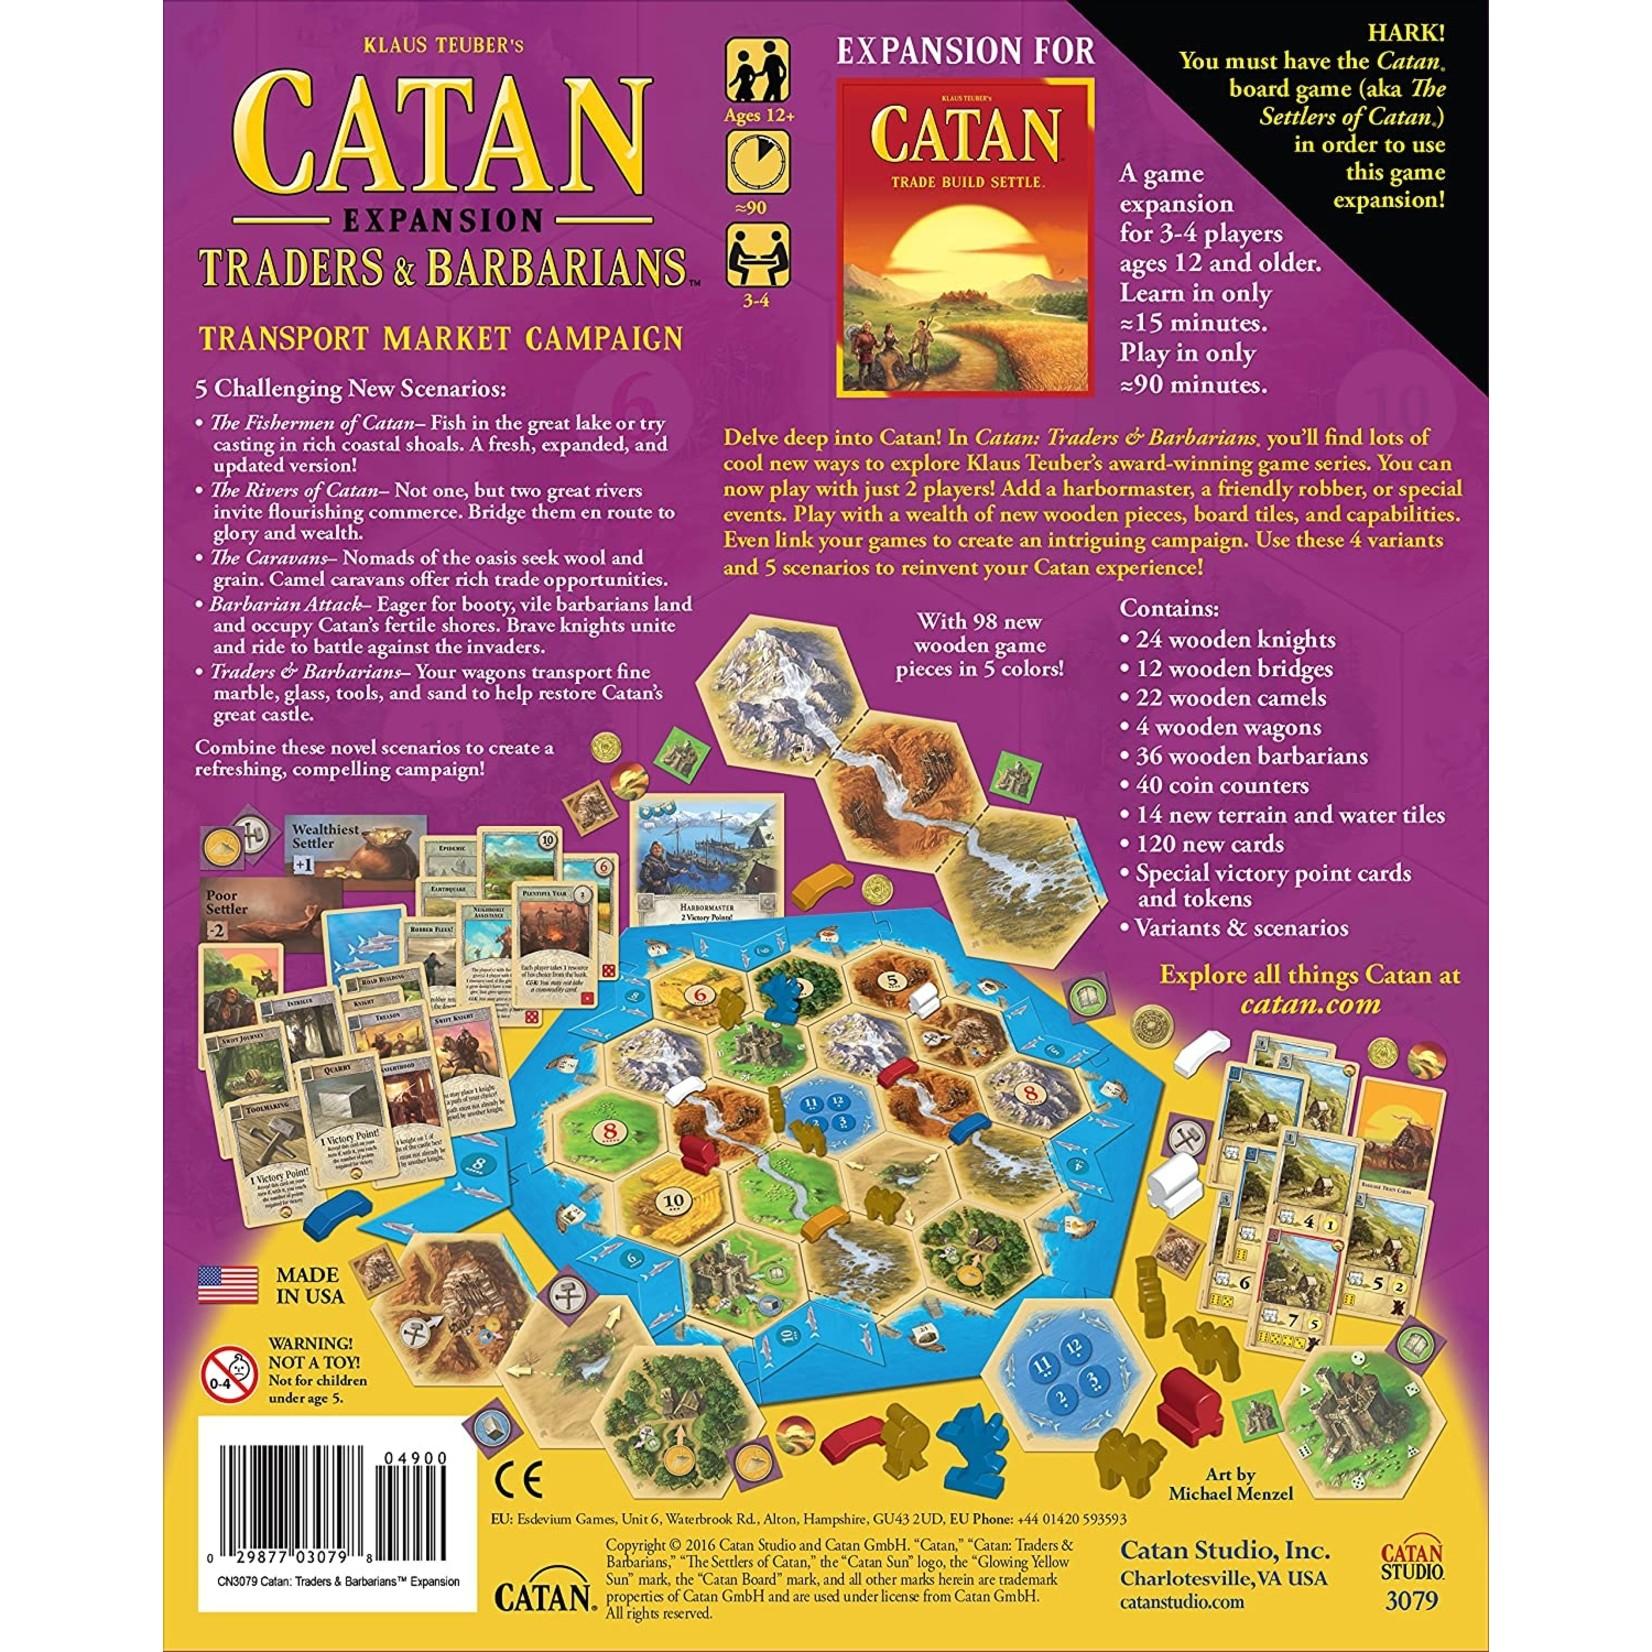 Catan Studios Inc. Catan: Traders and Barbarians Expansion